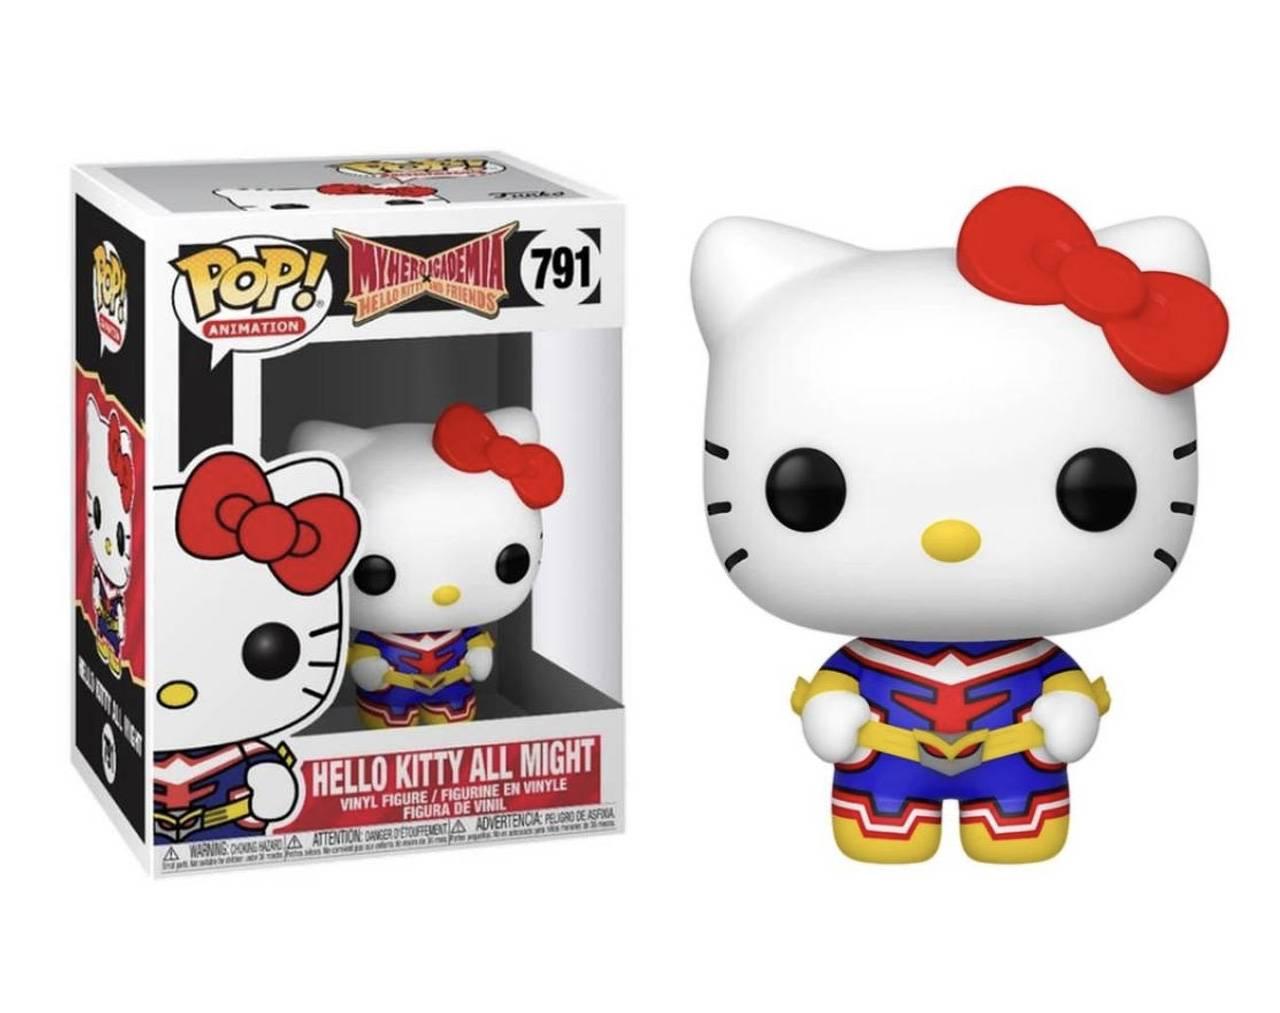 Hello Kitty All Might Pop! Vinyl